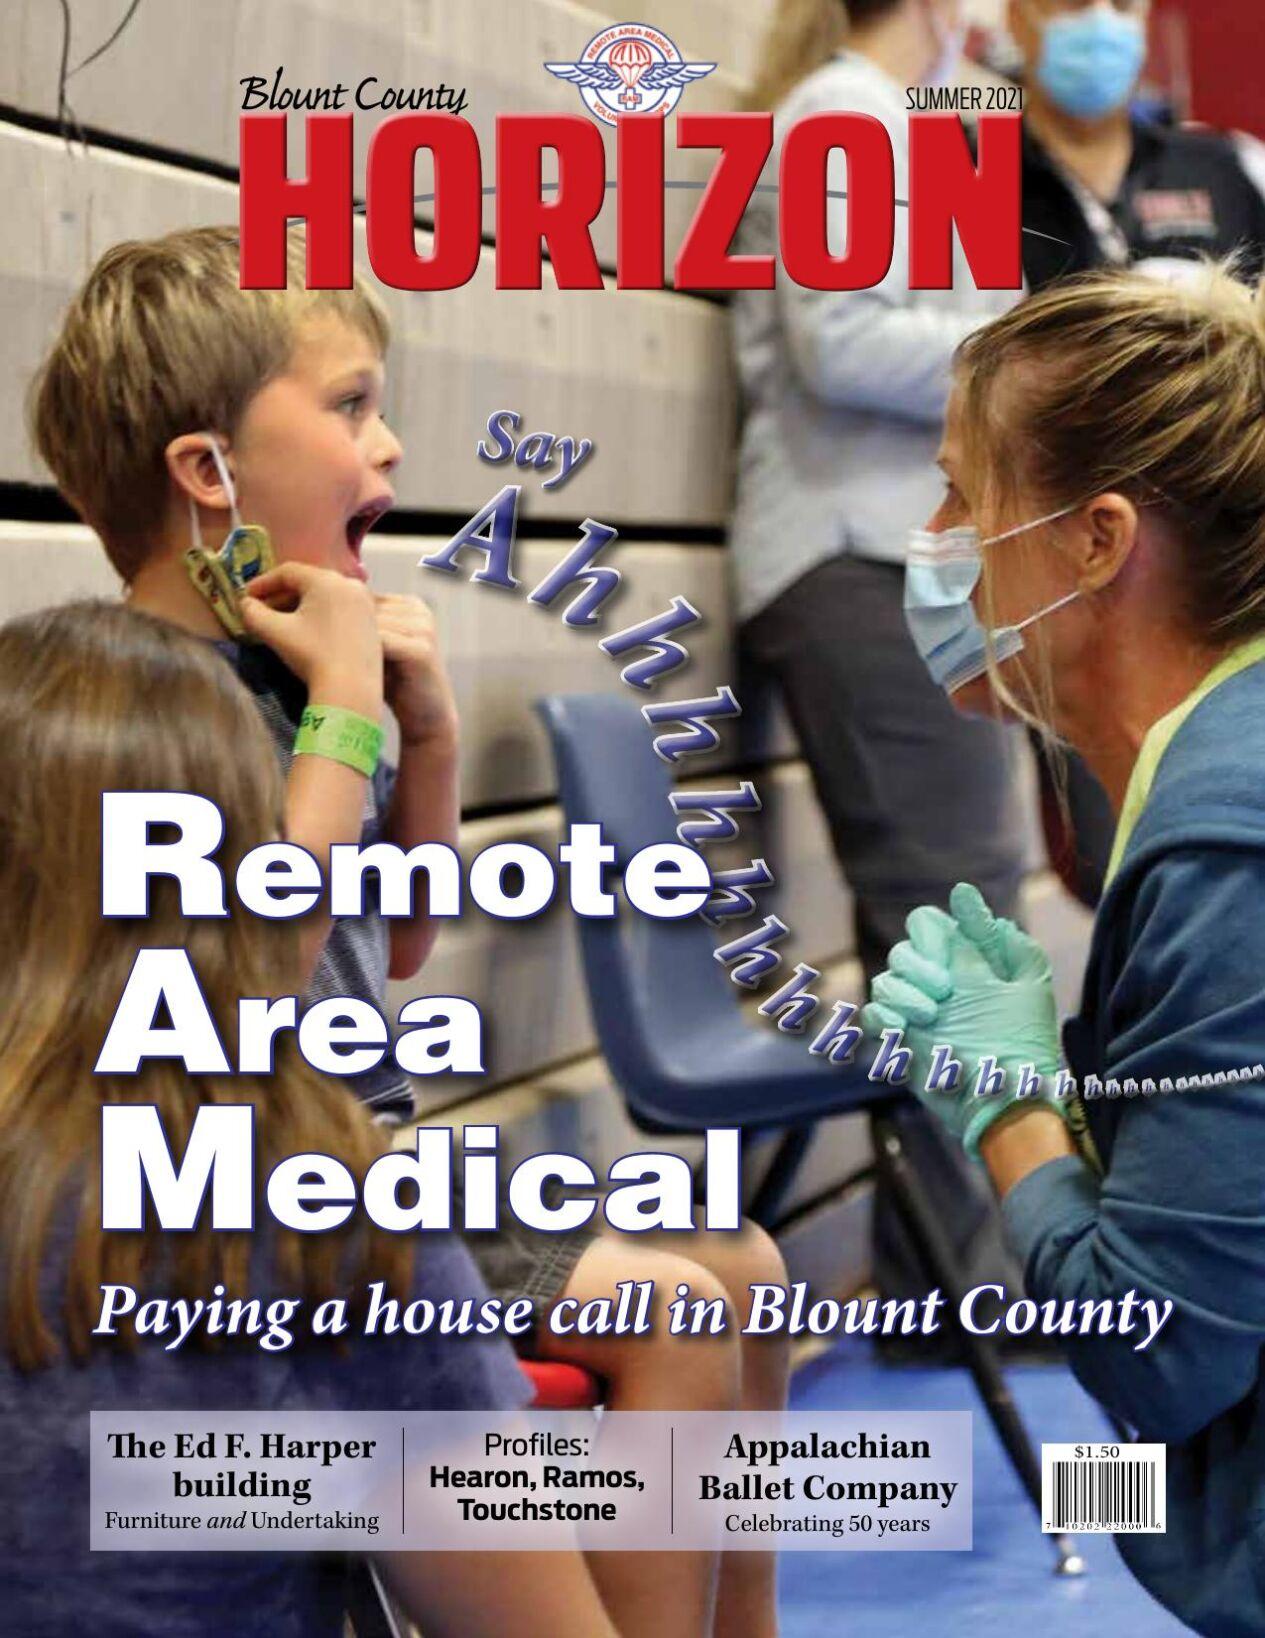 Blount County Horizon